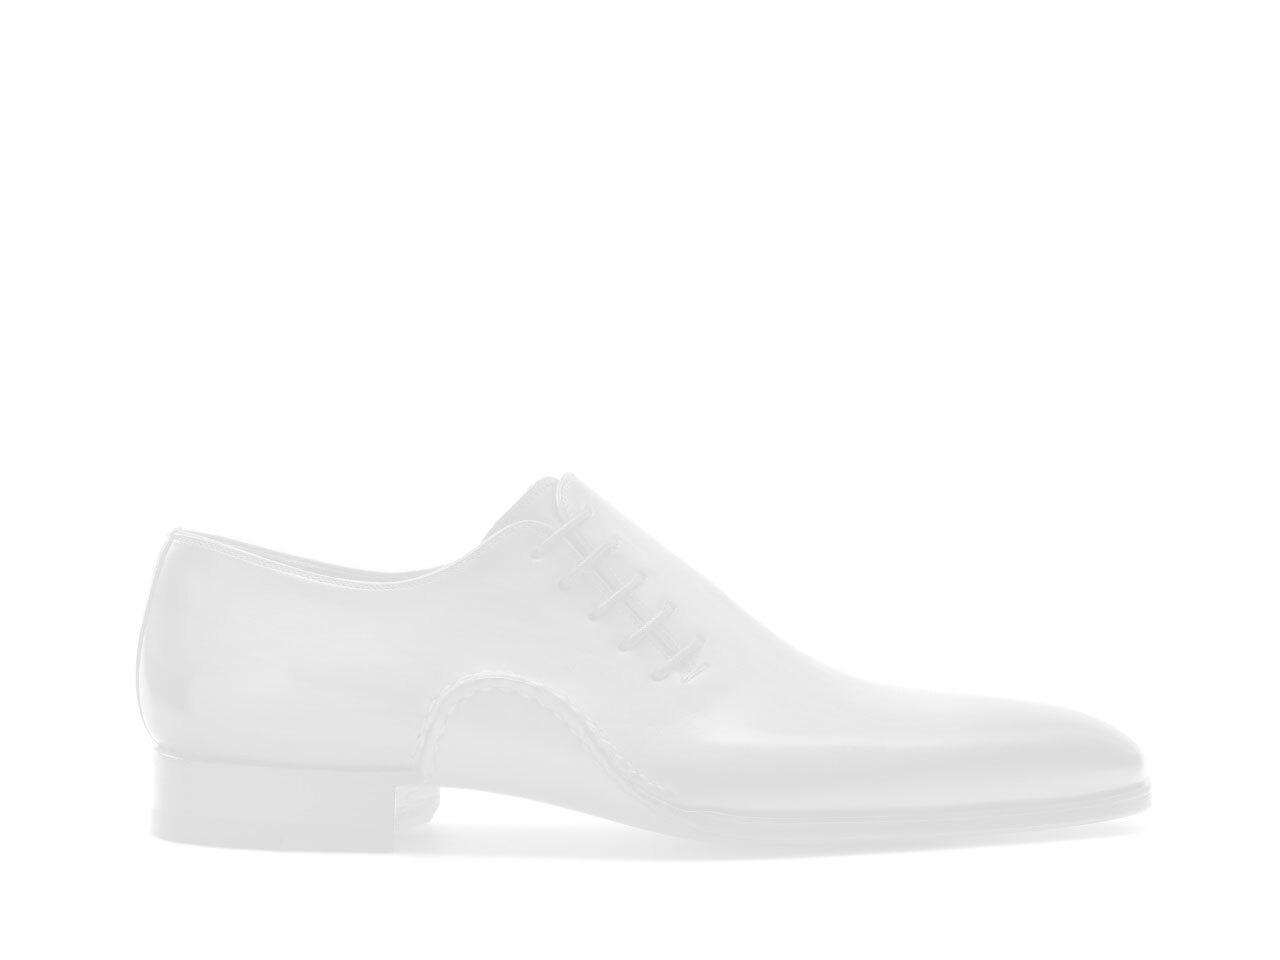 Sole of the Magnanni Jacoby II Cognac Men's Derby Shoes